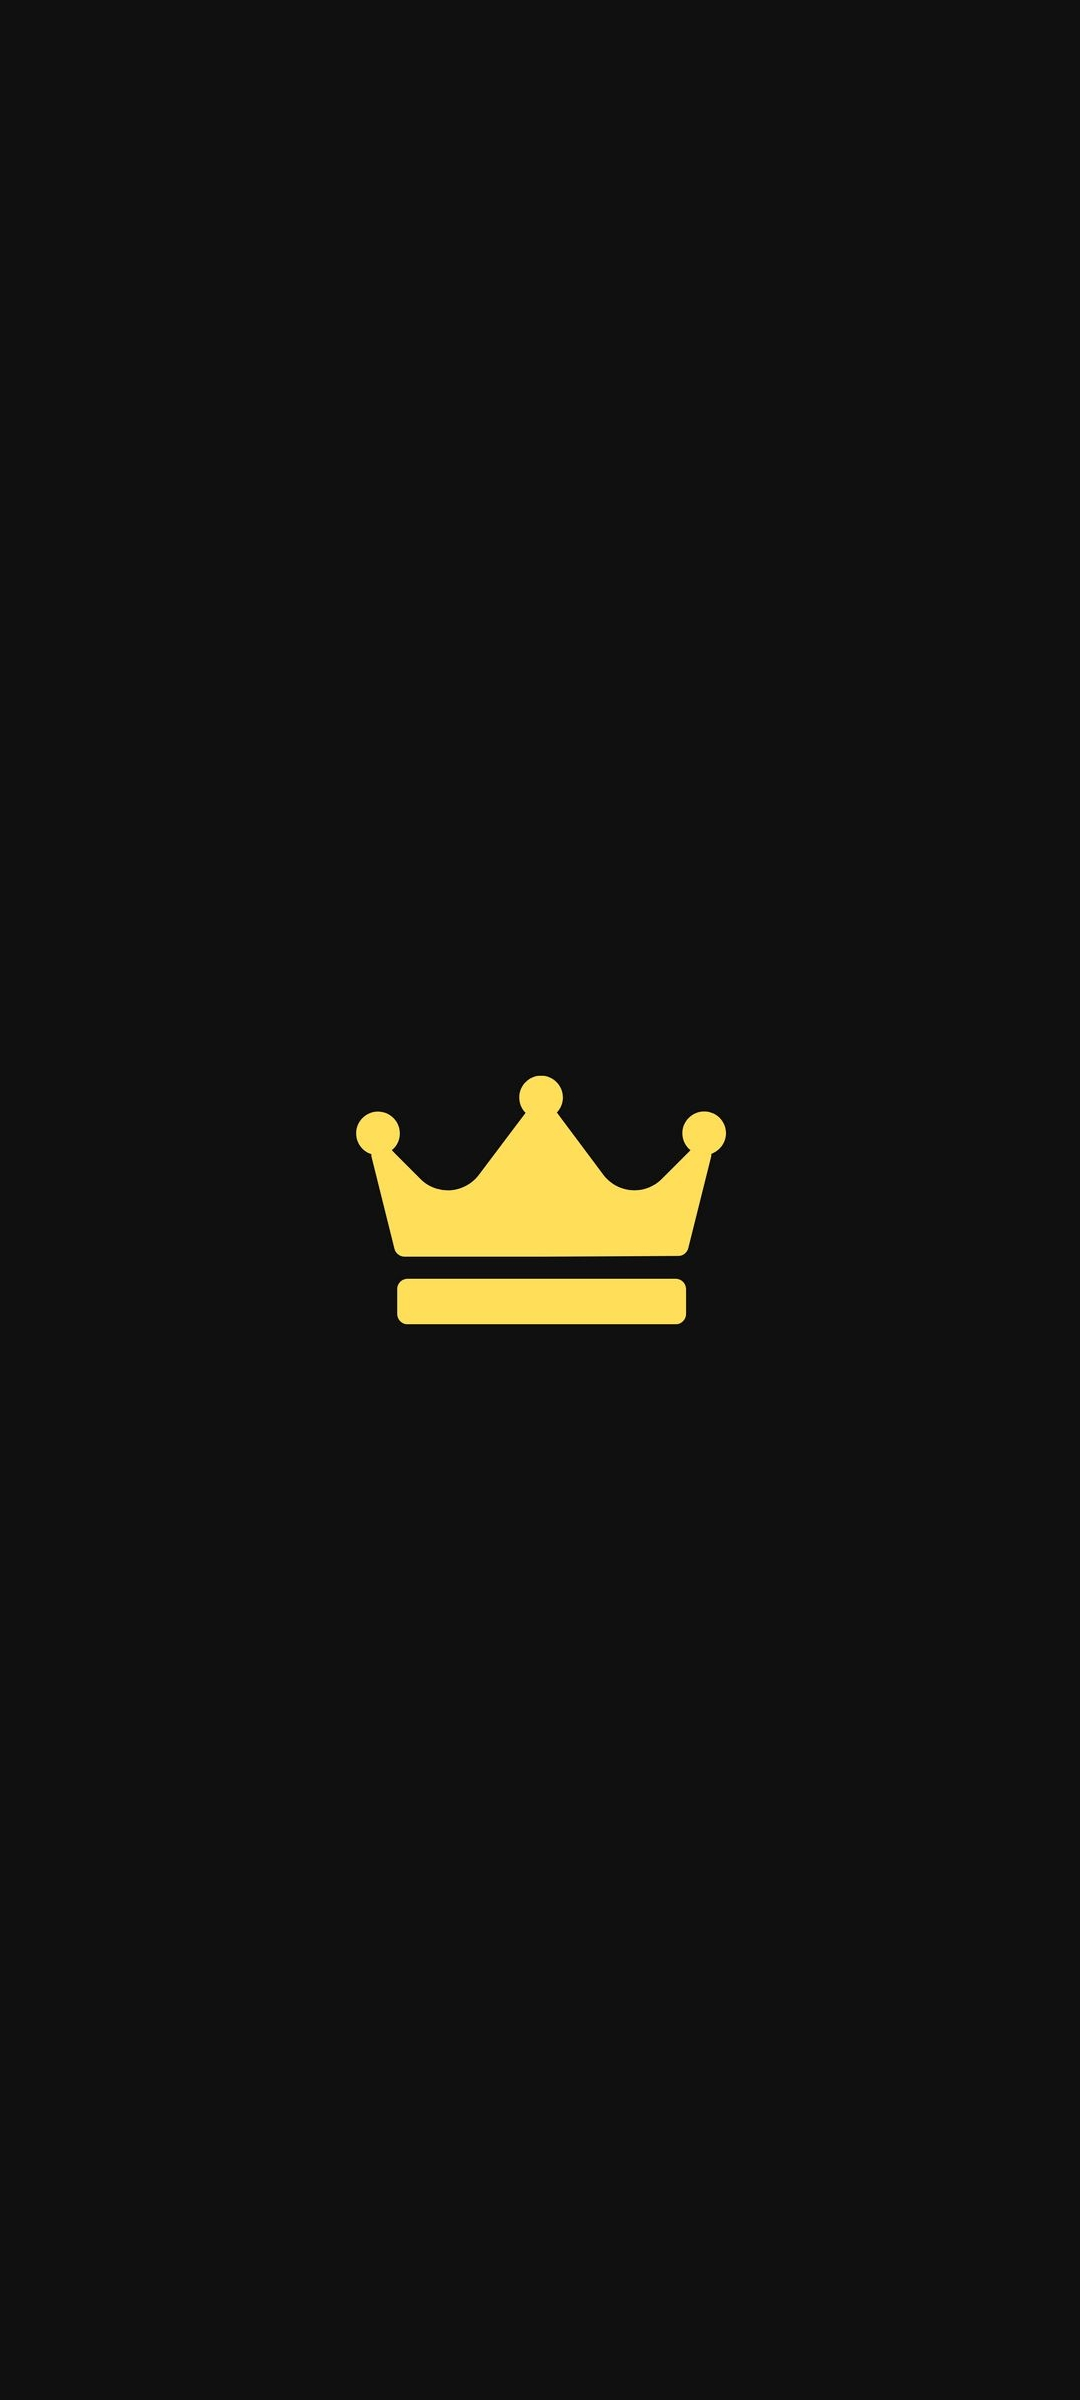 Crown Amoled Black Wallpaper